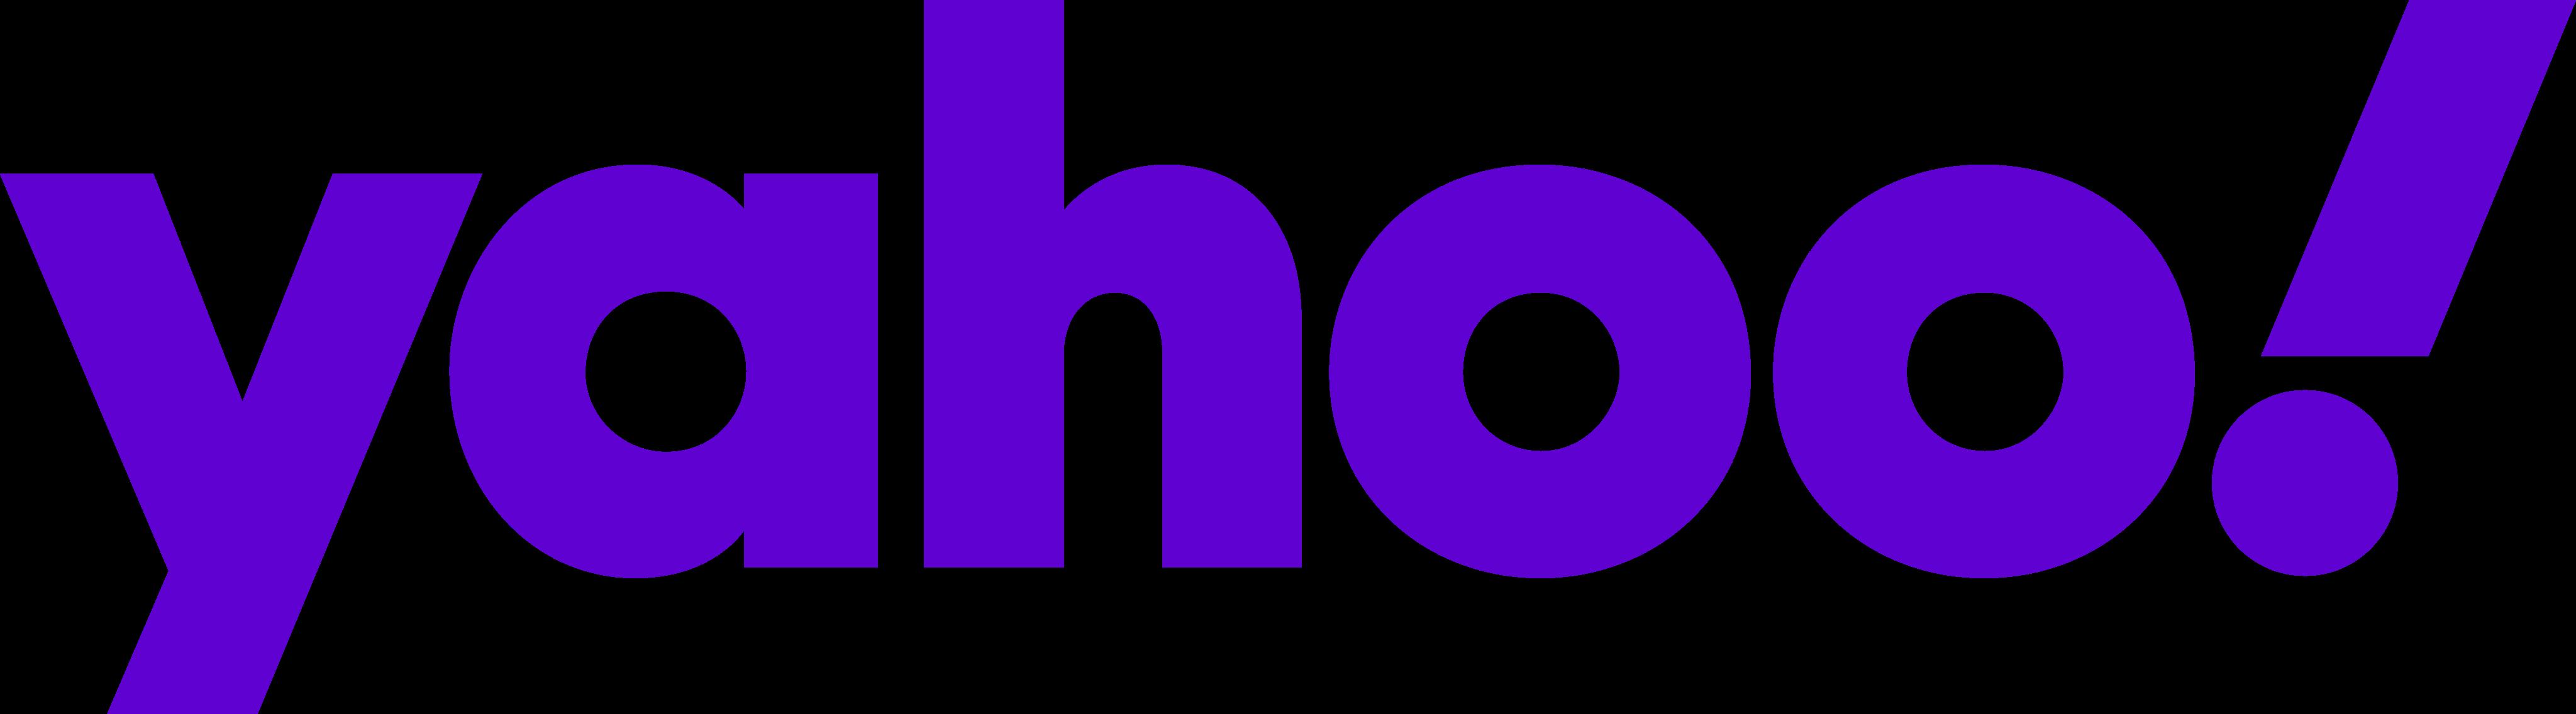 Yahoo Logo Png And Vector Logo Download